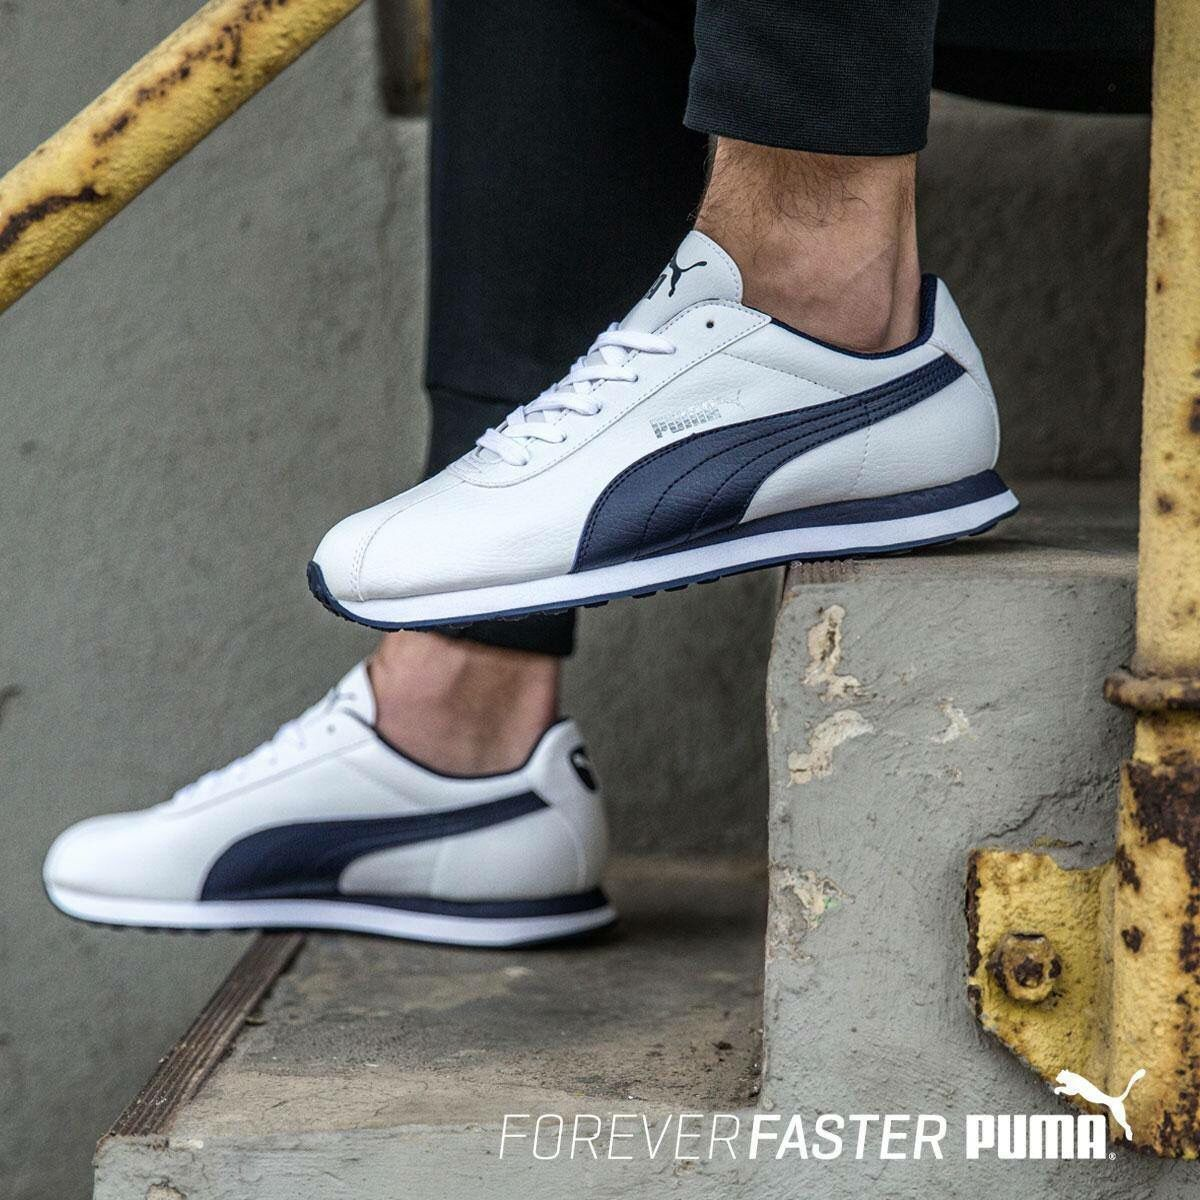 Puma Turin. Puma Turin Men s Sneakers ... 8c1789833